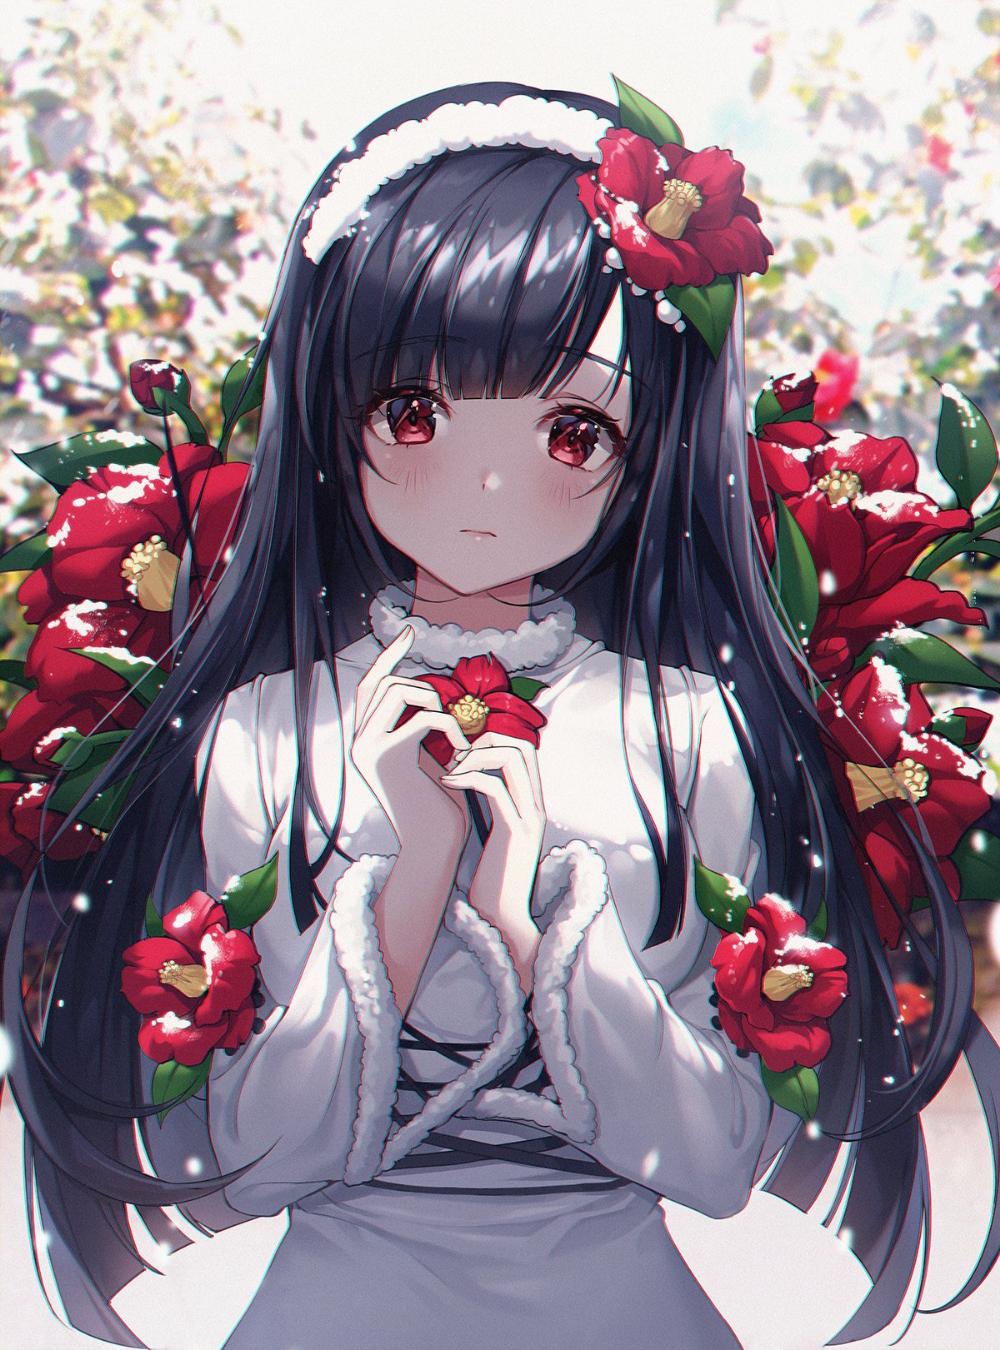 主页 / Twitter en 2020 (con imágenes) Arte de anime, Chica